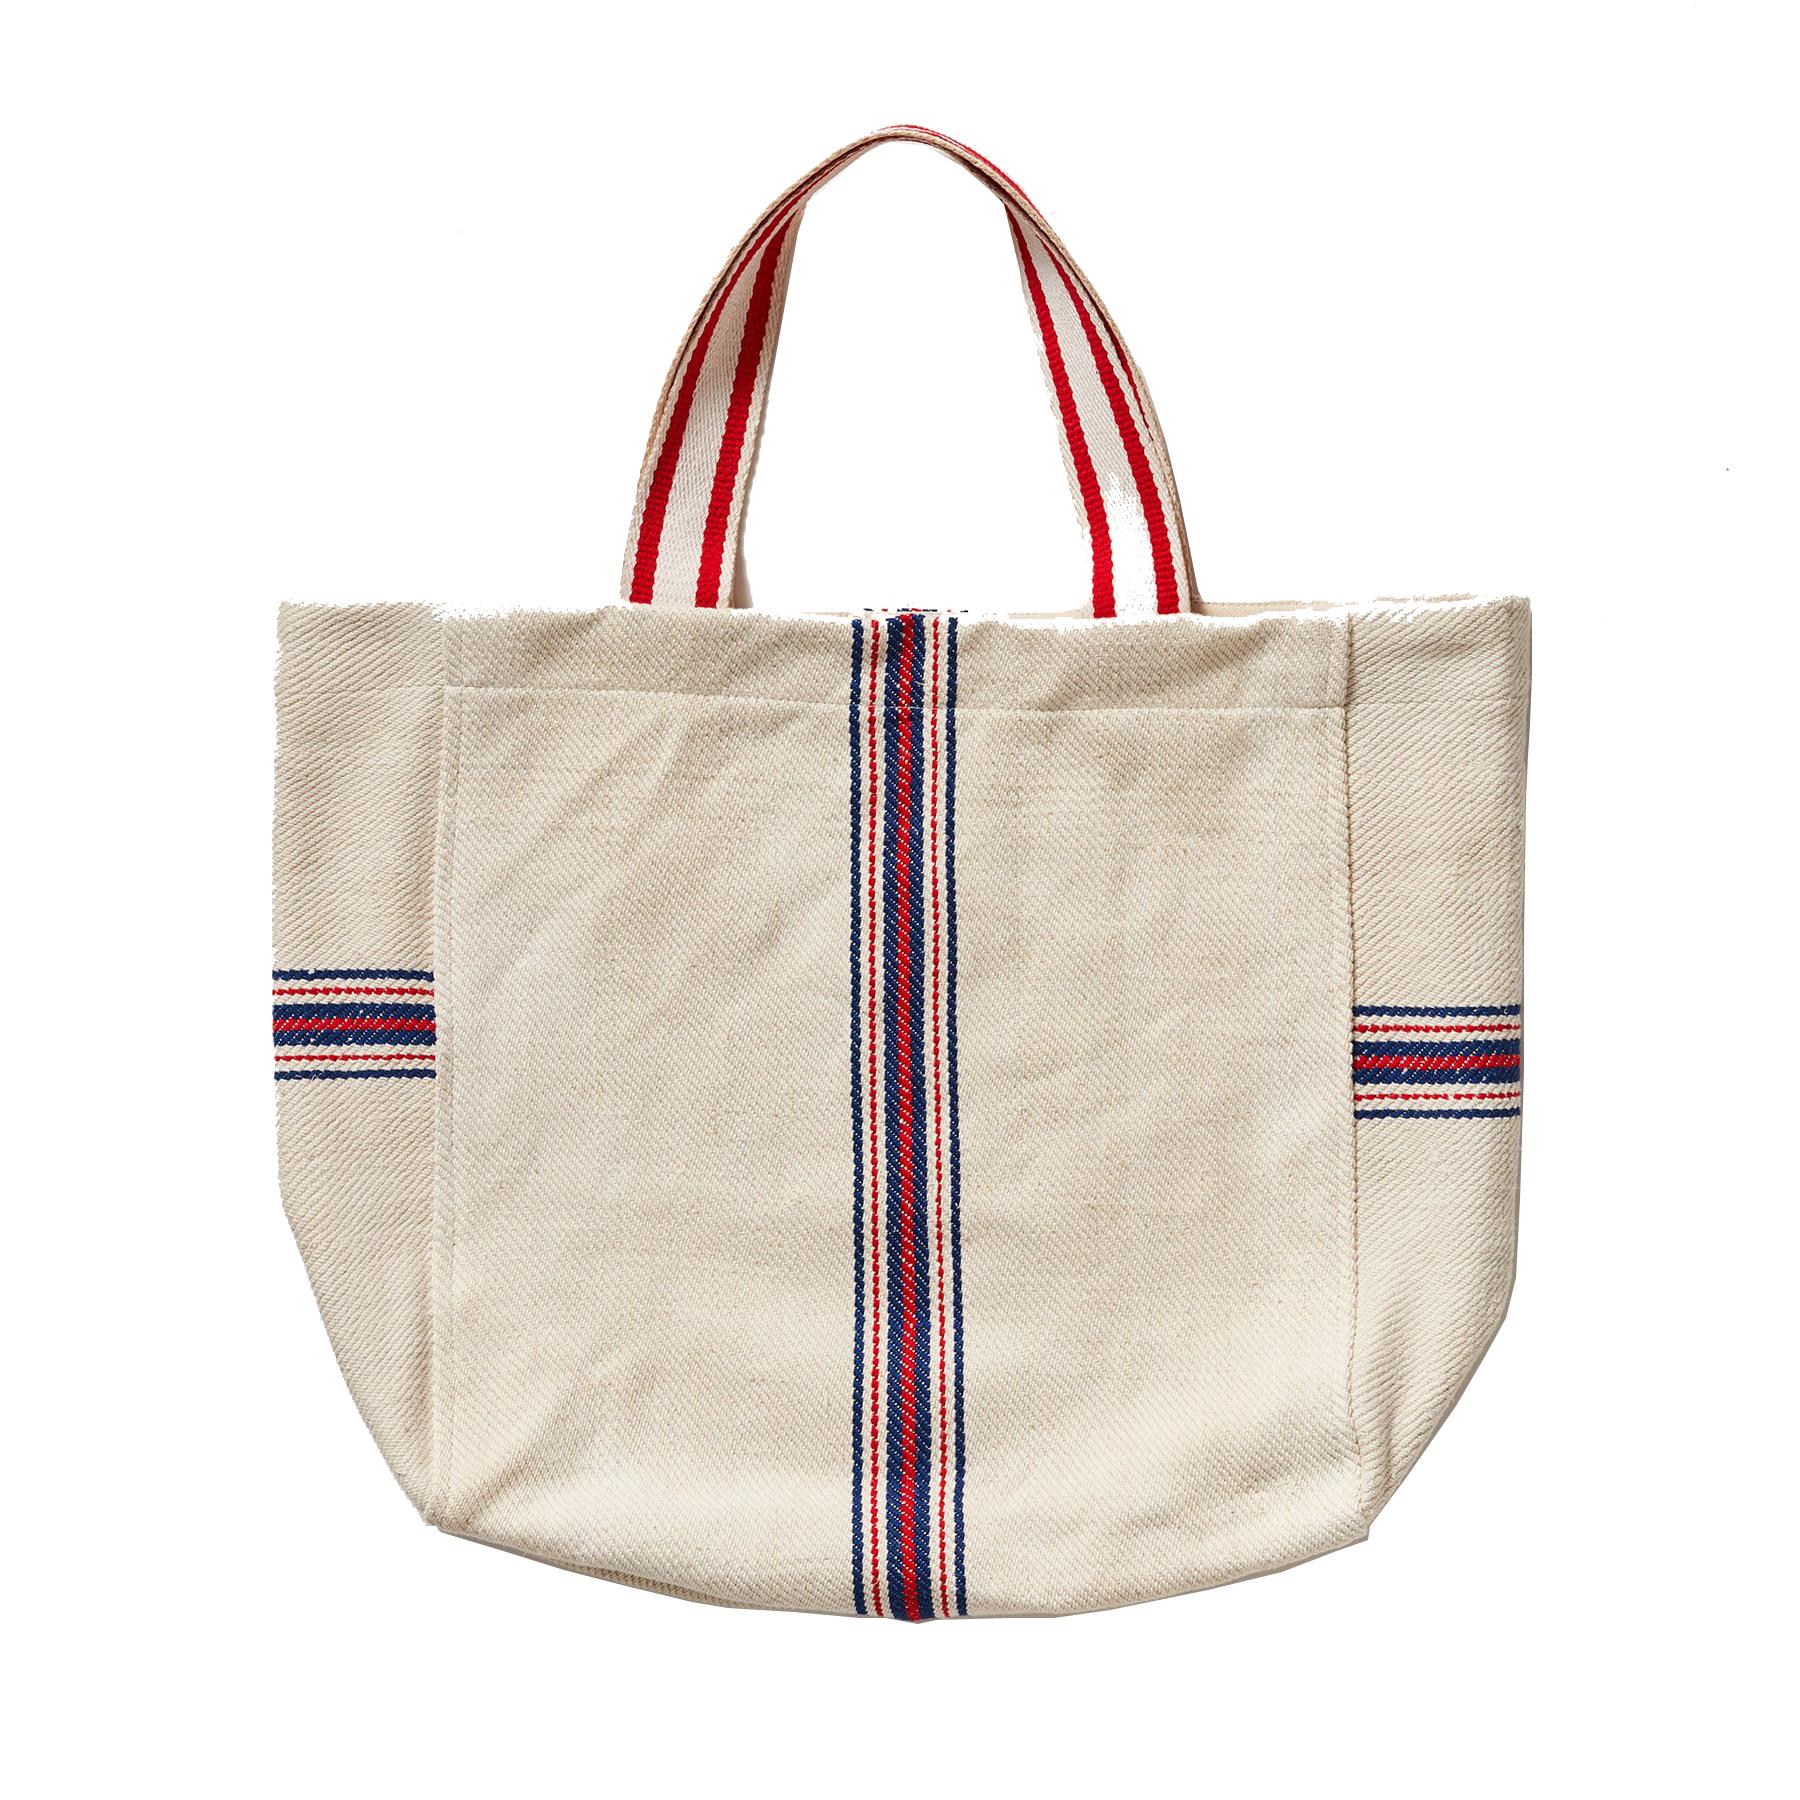 Bassike travel bag